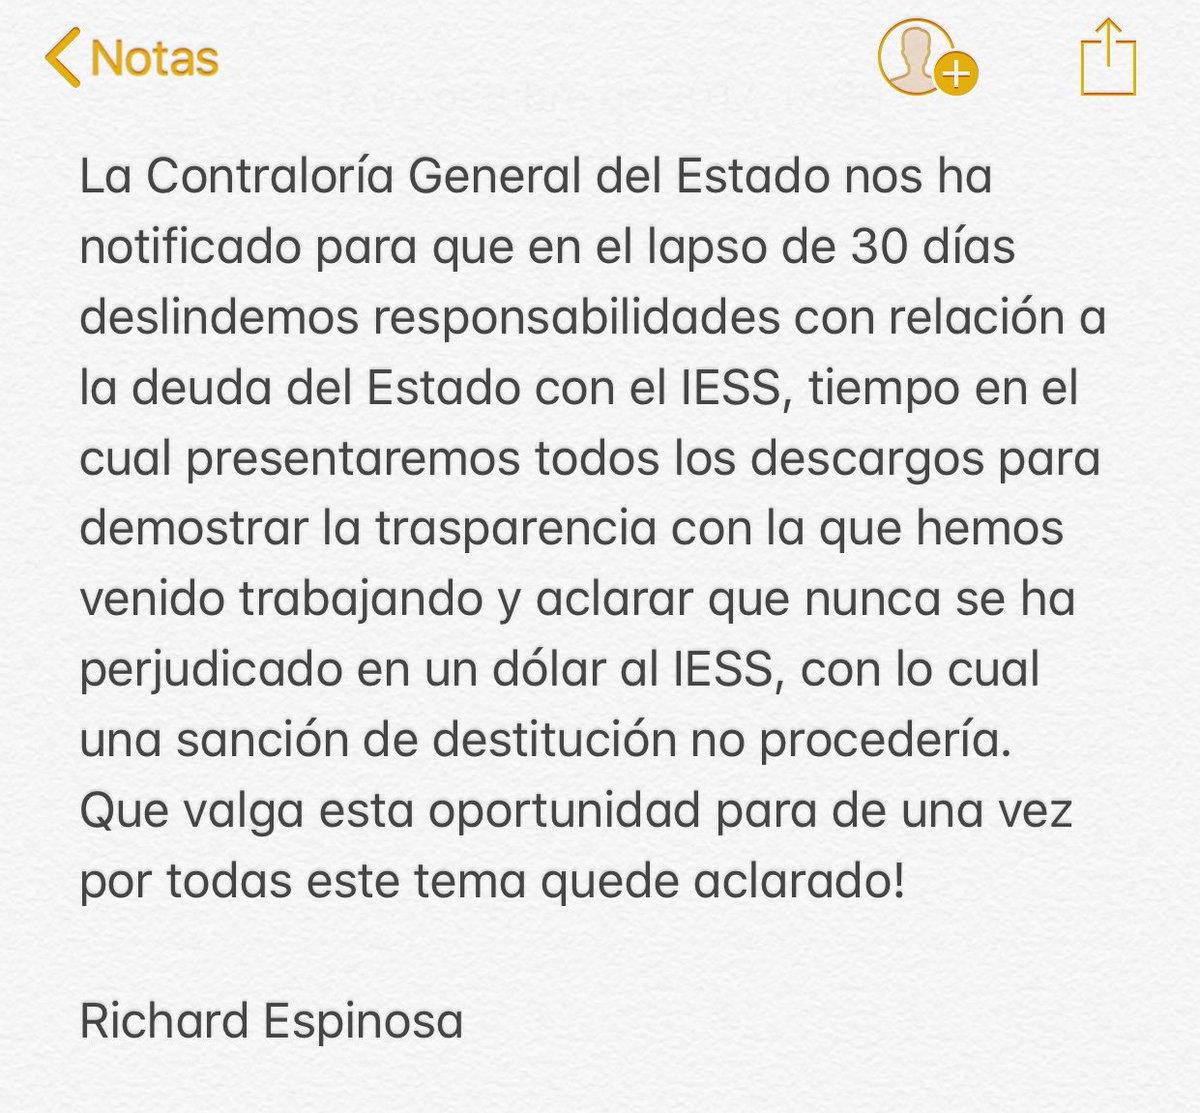 RT @REspinosa_G: La verdad siempre prevalecerá!! https://t.co/QRFHGjVTRu